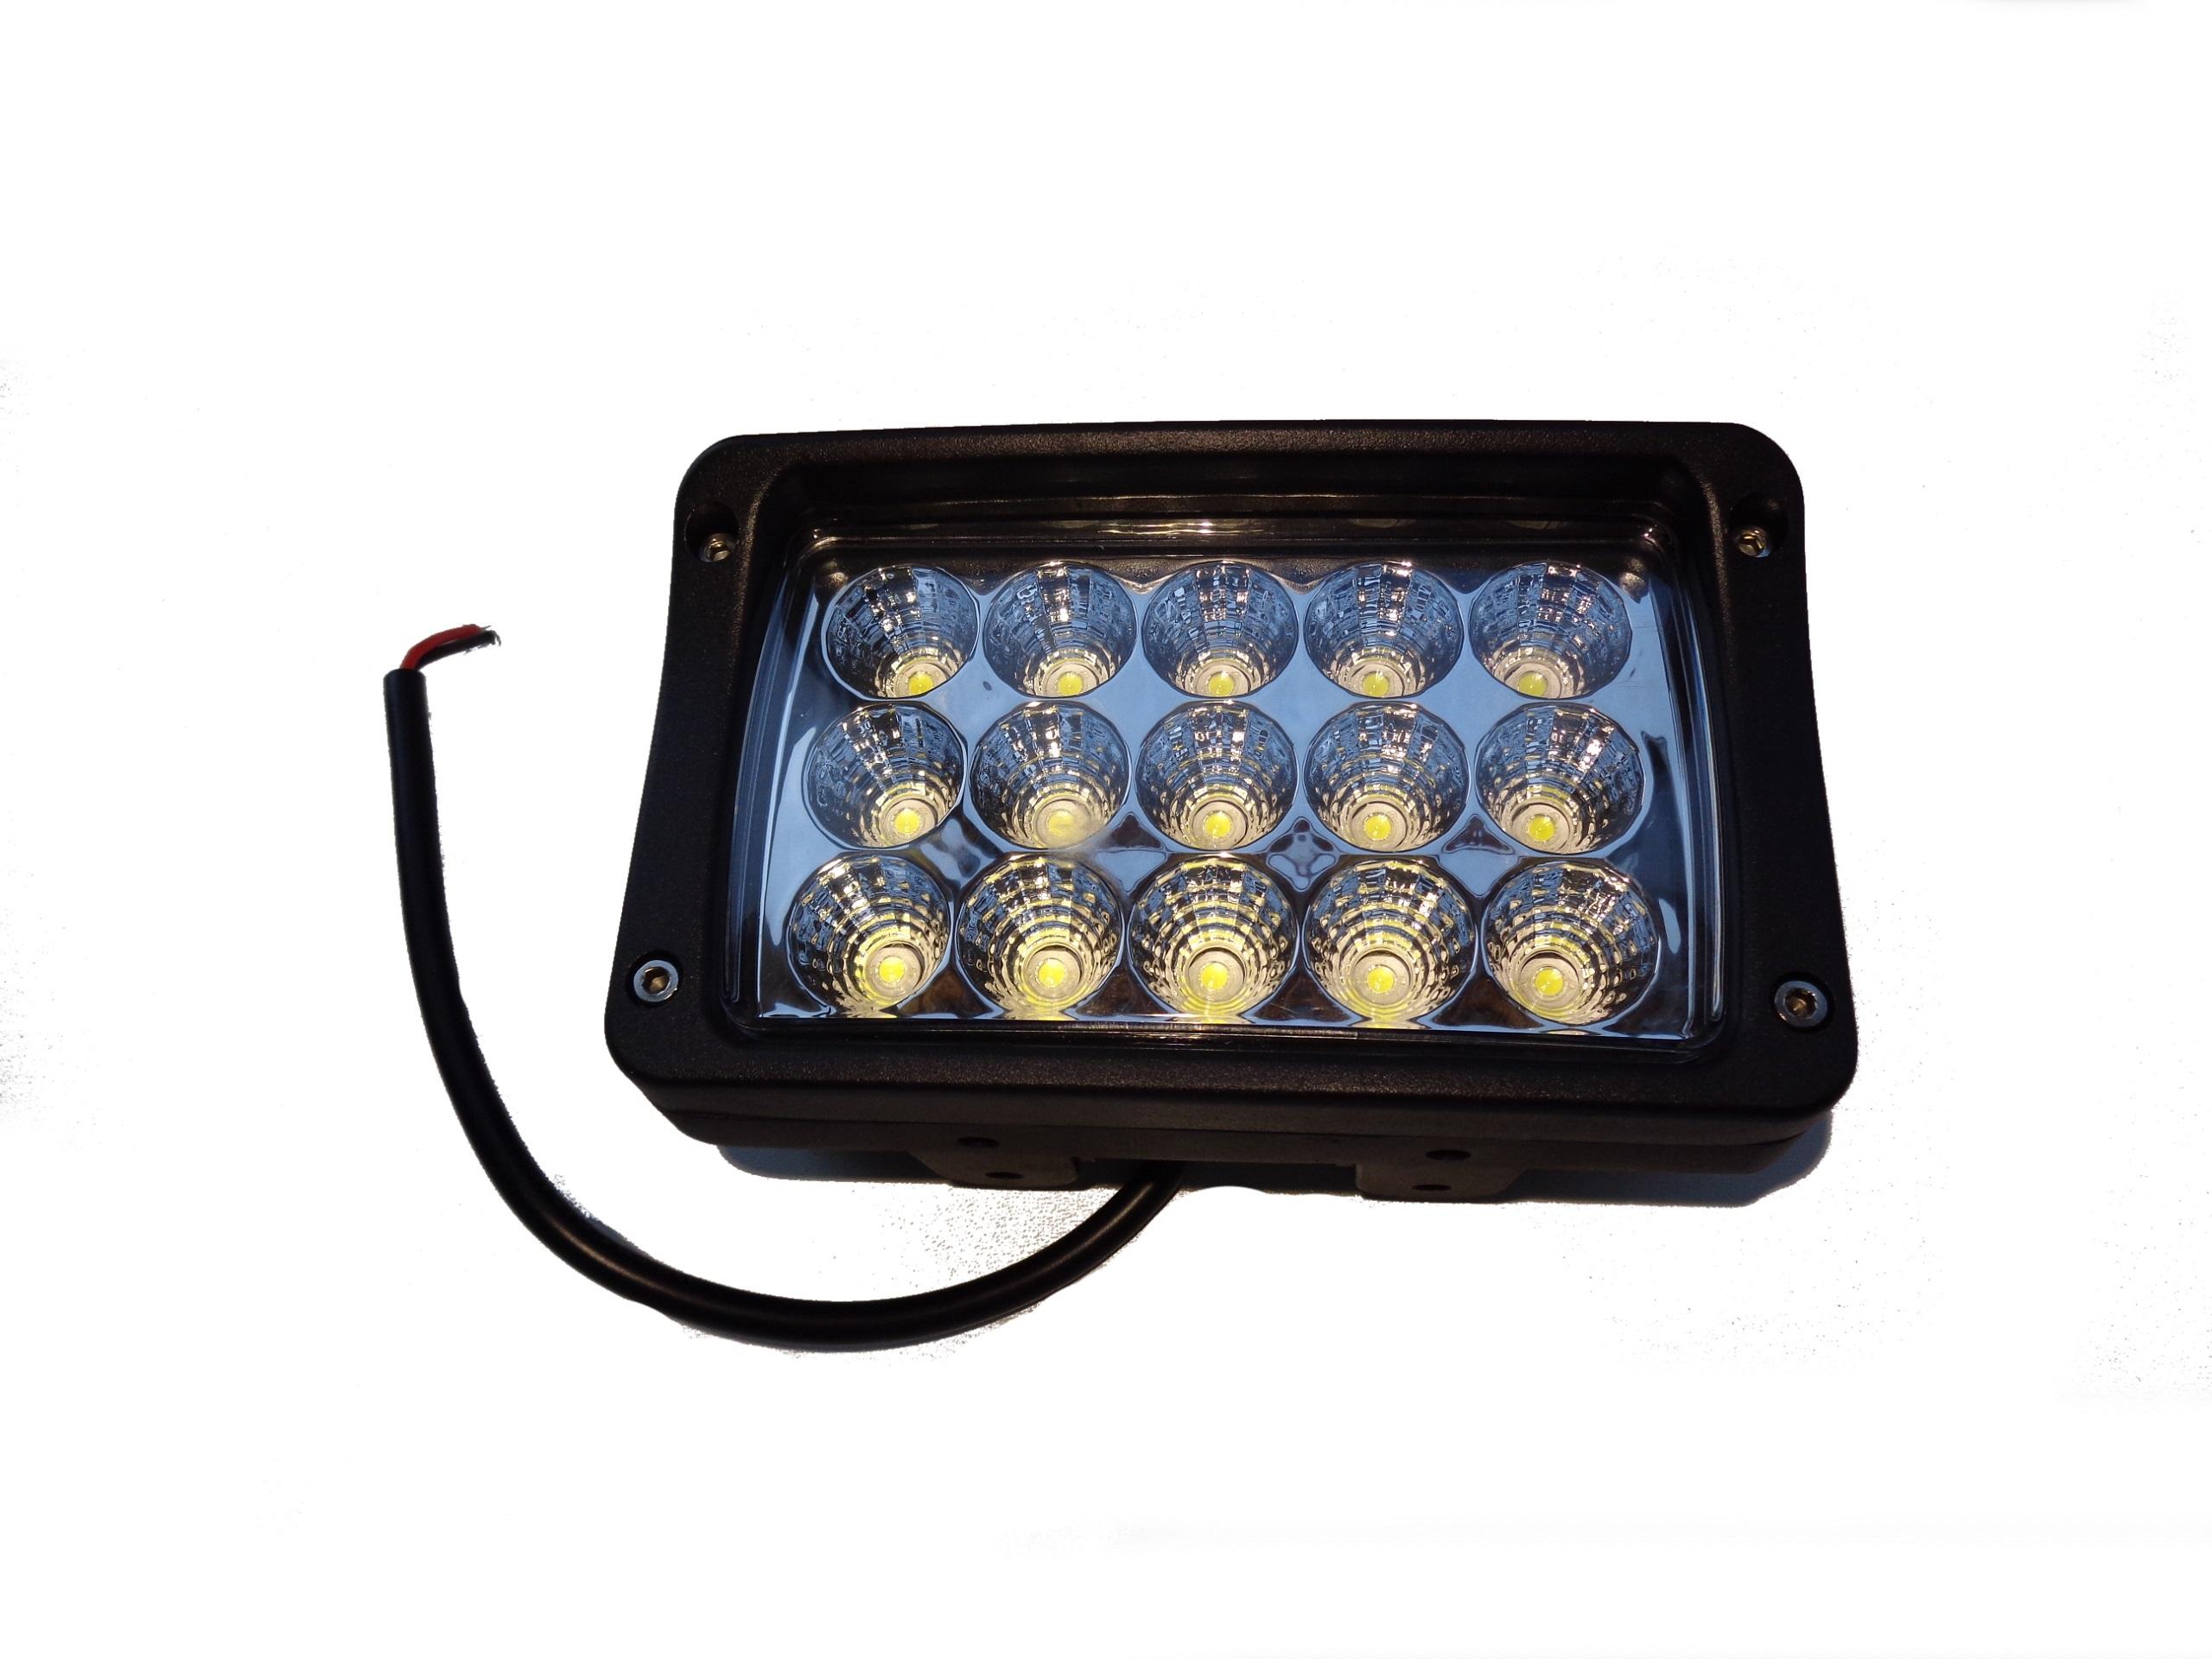 Светодиодная рабочая лампа LED, ГАЛОГЕН, ПРОЖЕКТОР, 12V,24 JCB